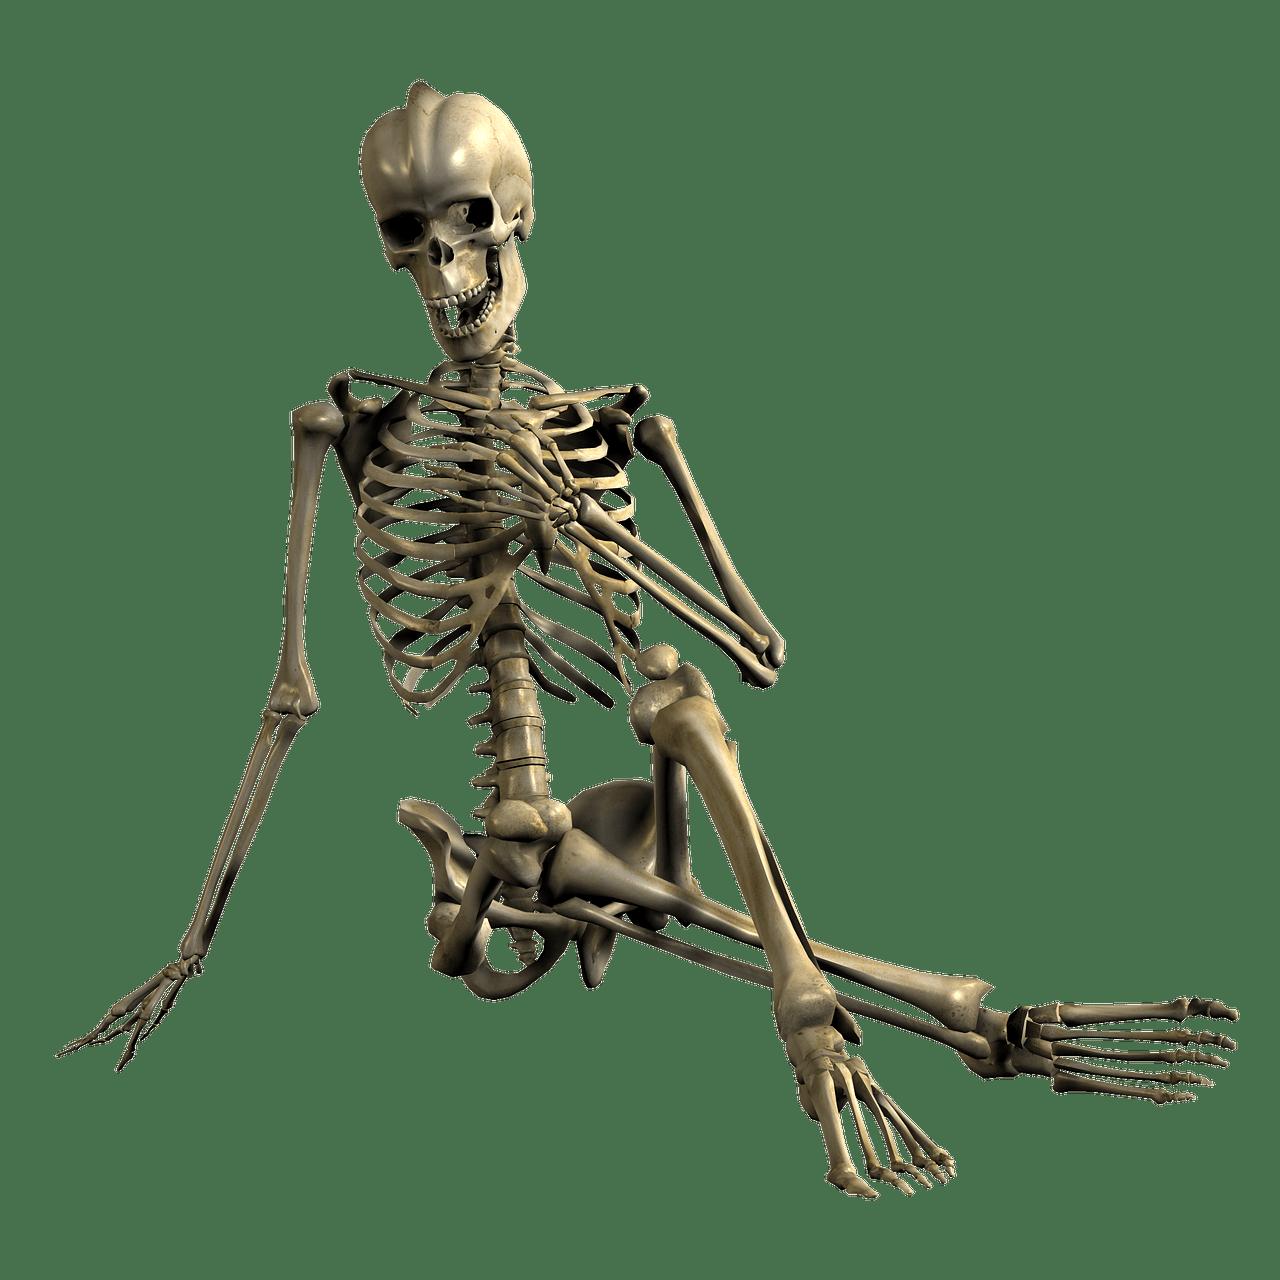 Esqueleto Mano en Frente del Pecho PNG transparente - StickPNG